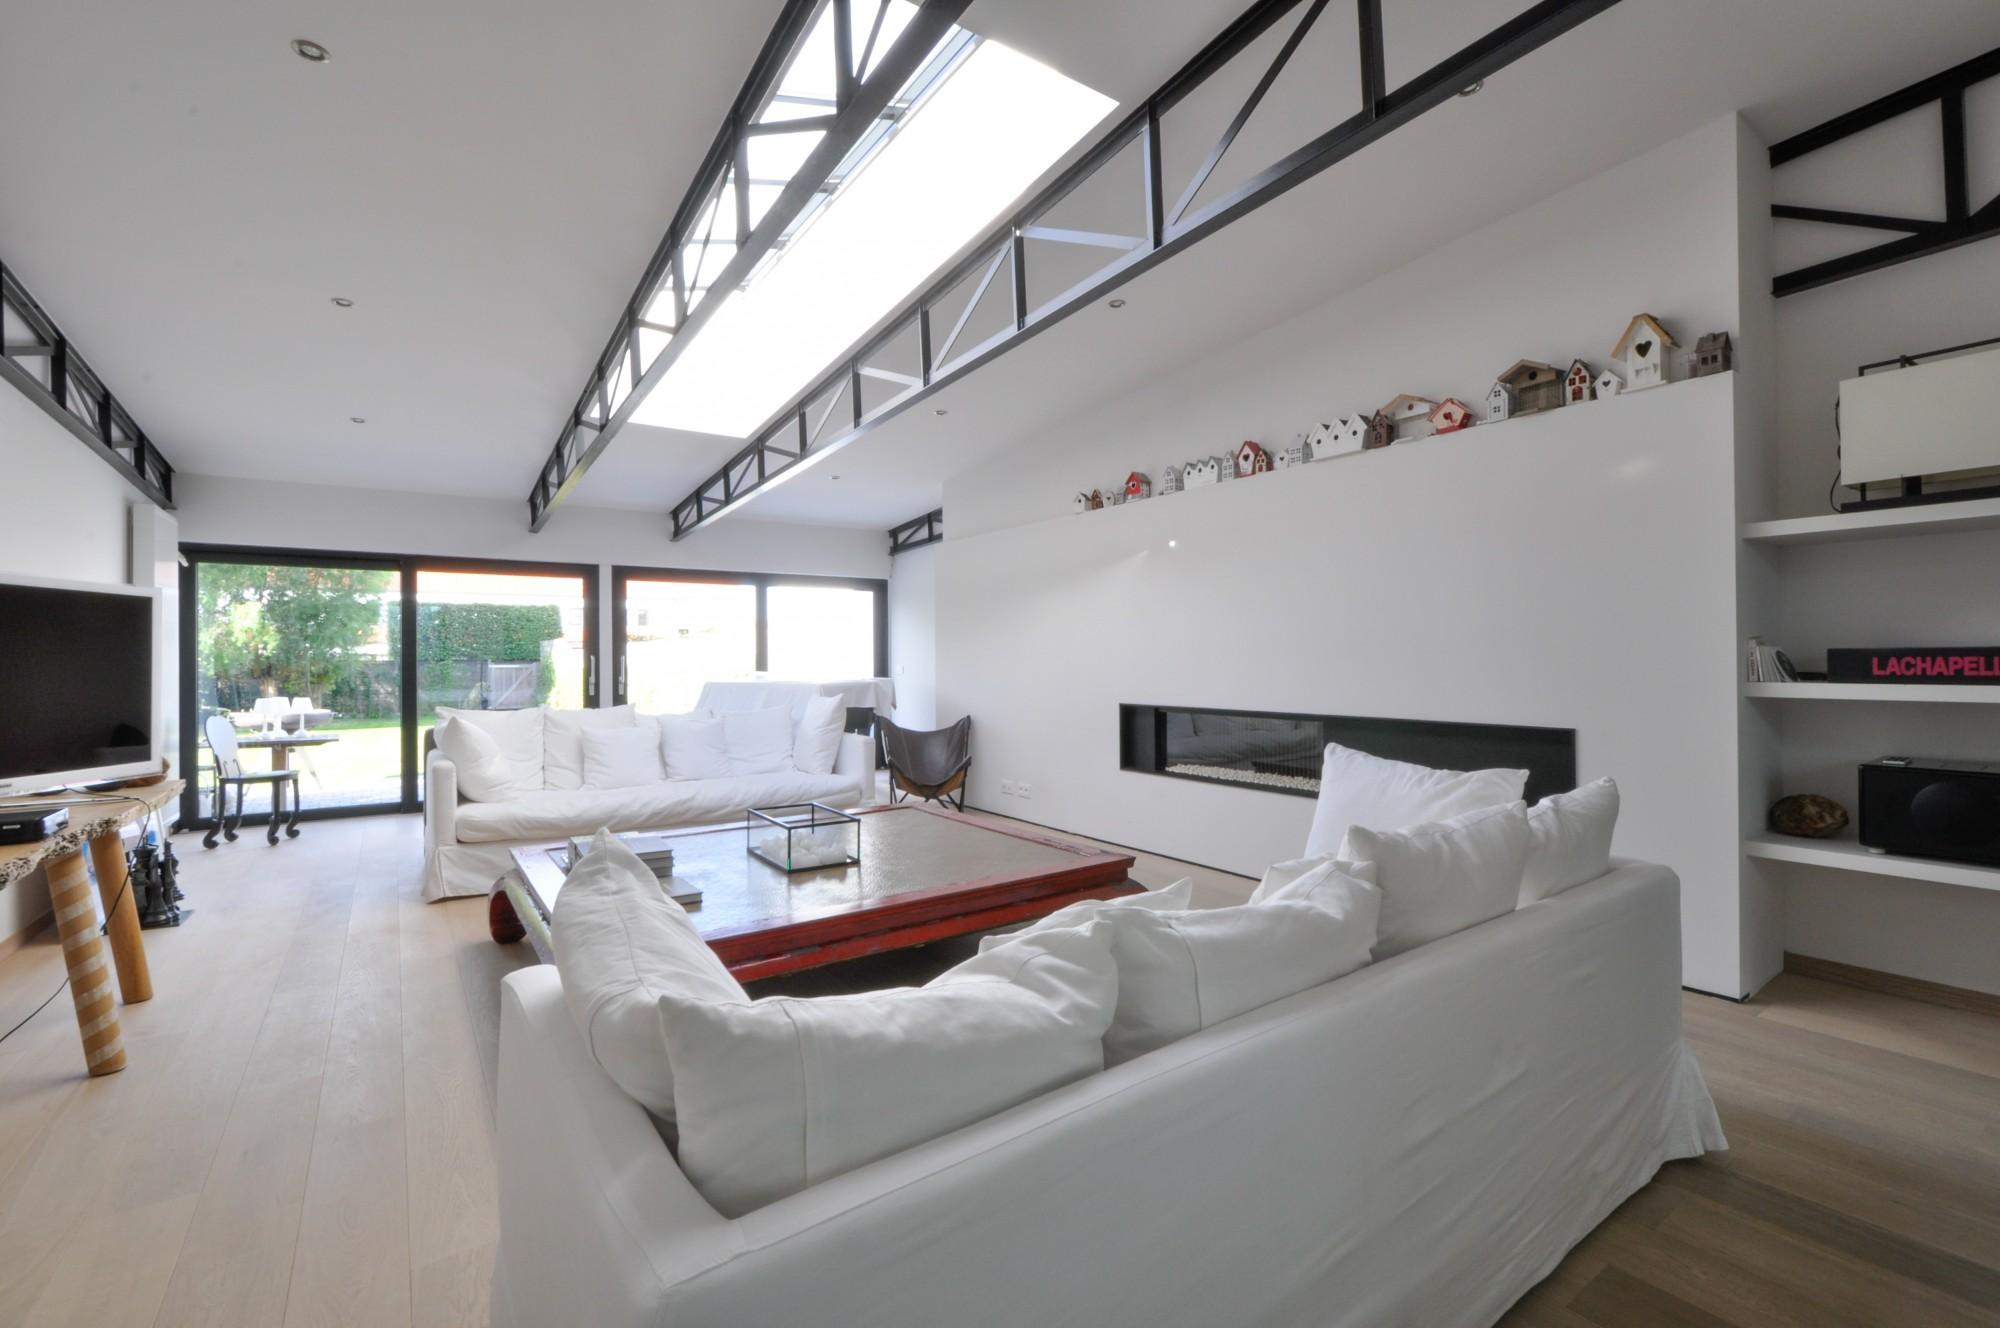 Te huur appartement 3 slaapkamers Knokke-Zoute Mini-Golf garage ...